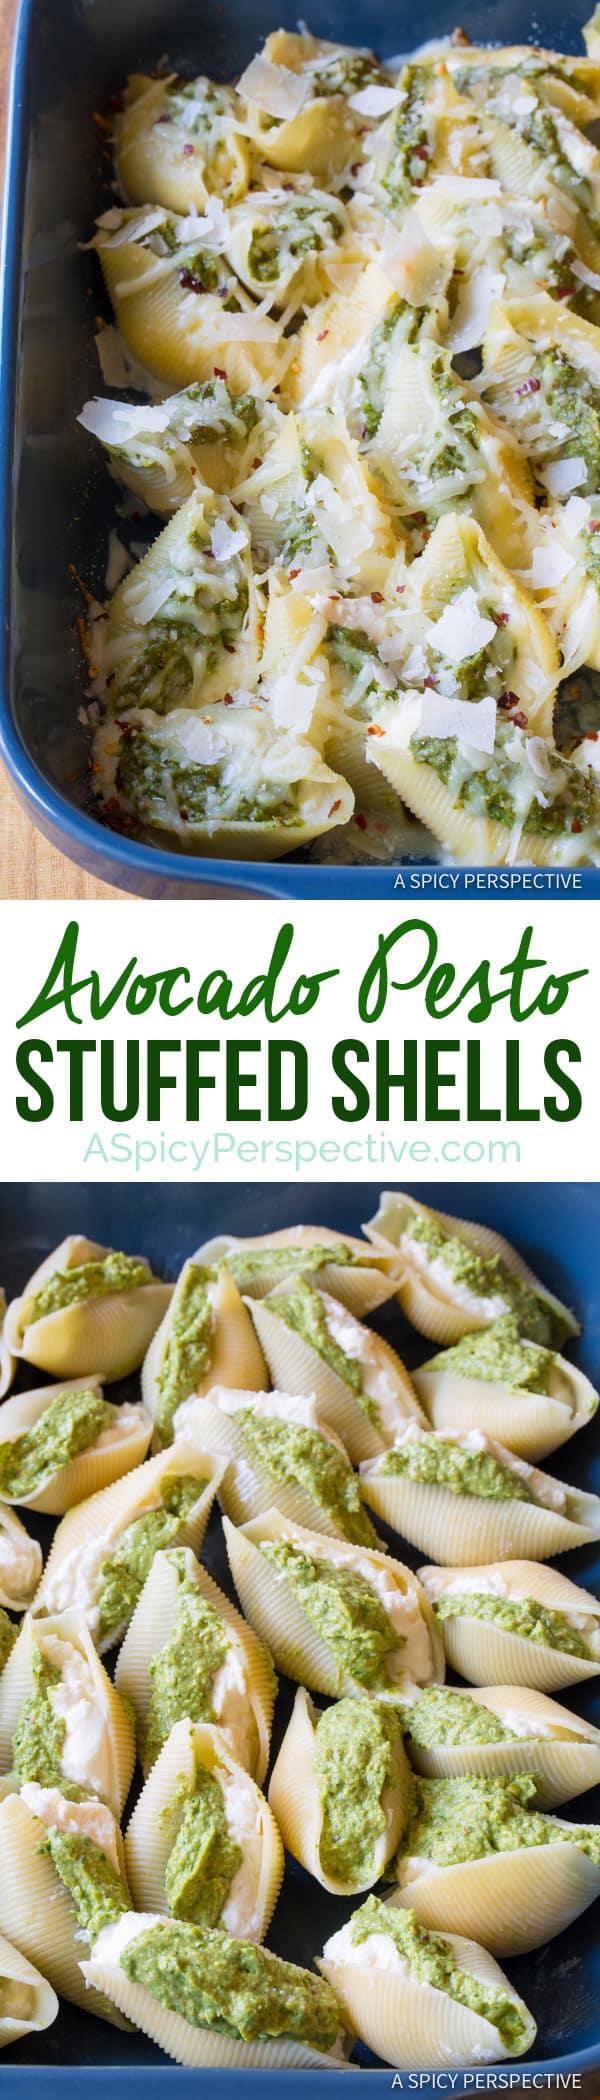 Zesty Avocado Pesto Stuffed Shells Recipe   ASpicyPerspective.com